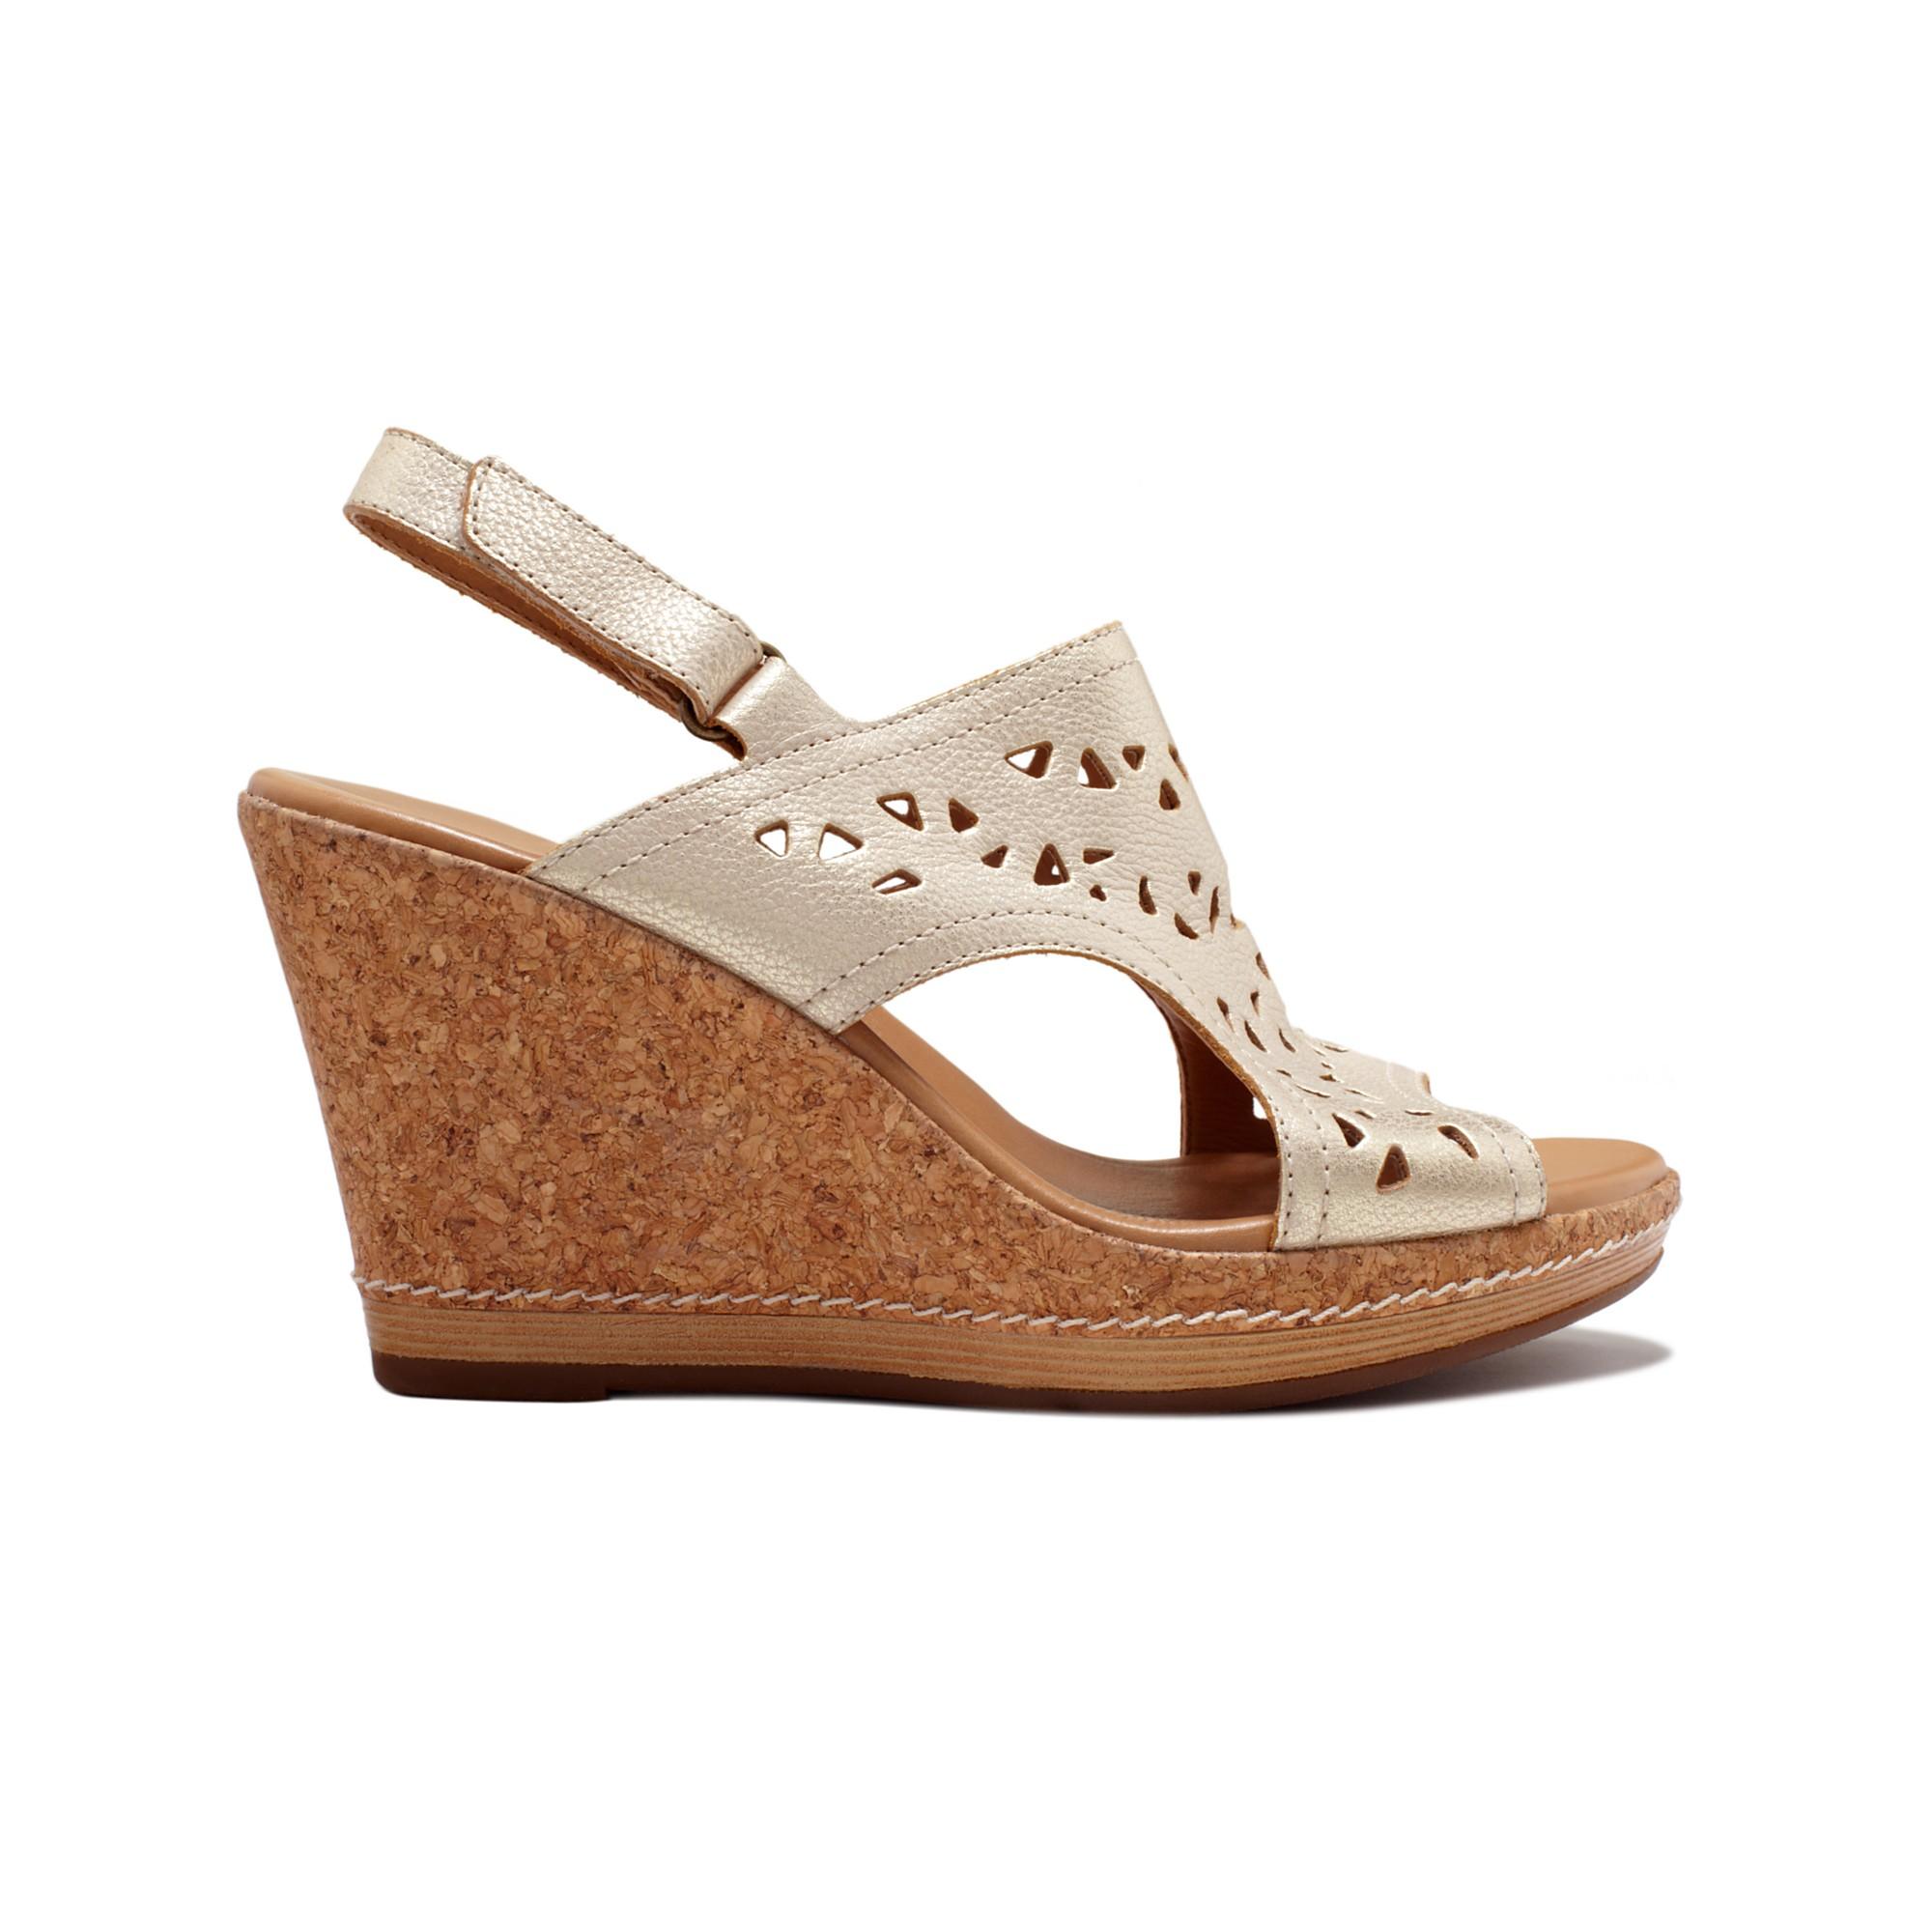 clarks pitch mint platform wedge sandals in brown lyst